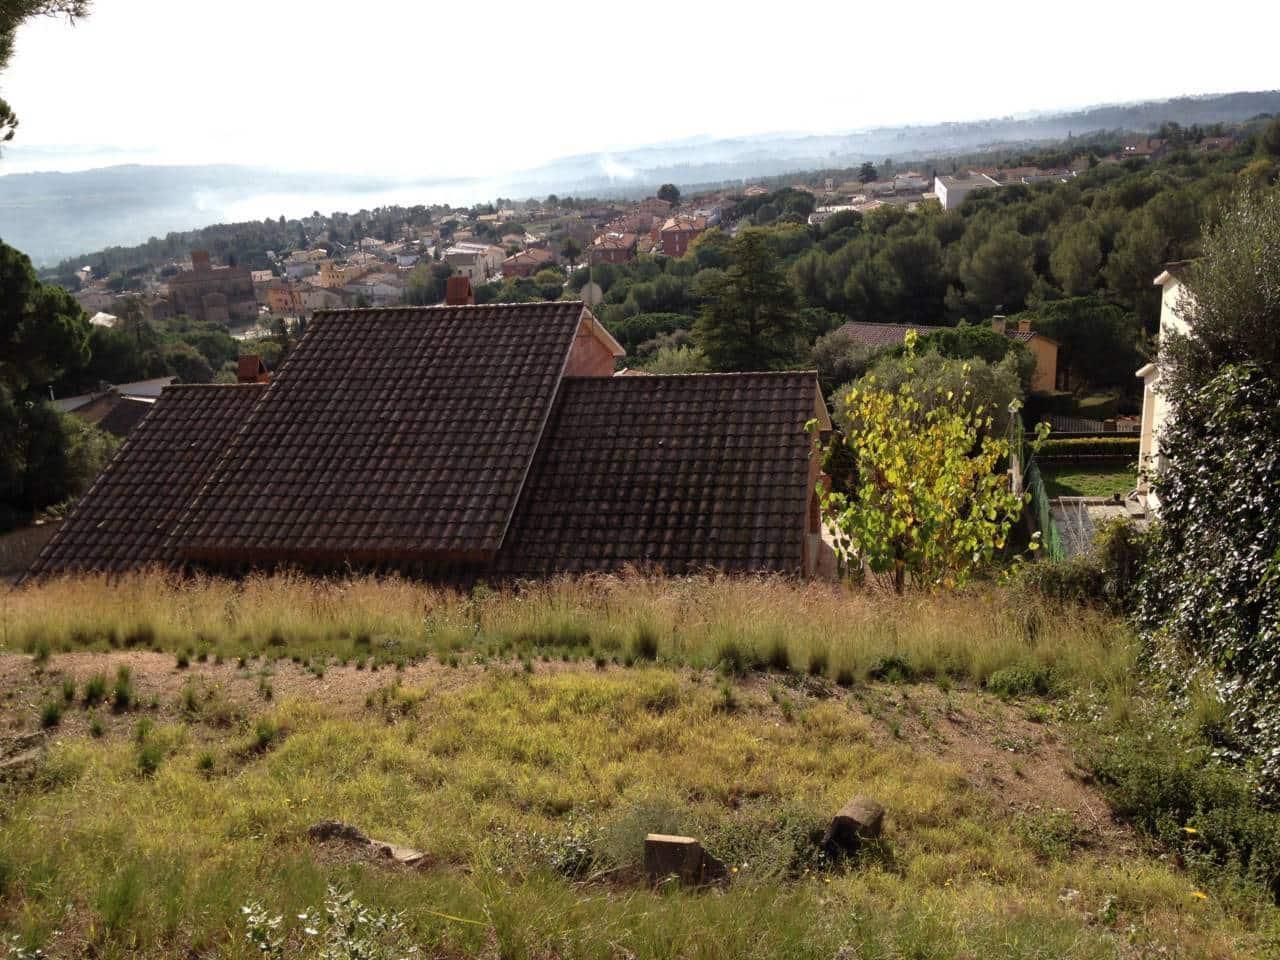 Solar/Parcela en Santa Eulàlia de Ronçana en venta - 129.000 € (Ref: 4029452)